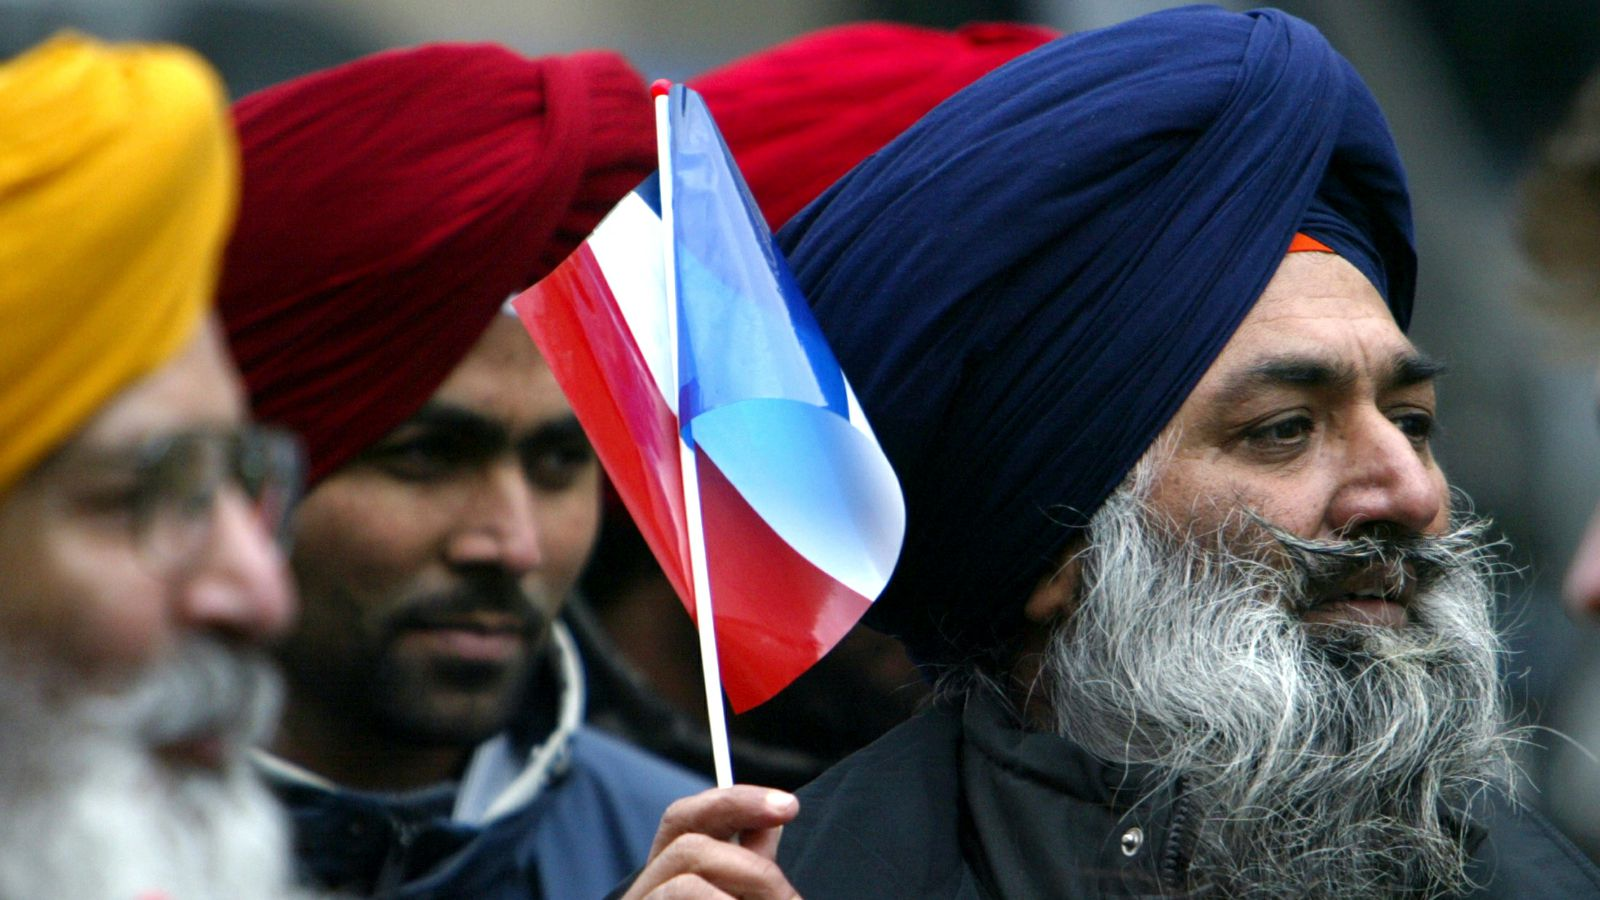 France's Sikh Minority Looks Set to Vote Against Marine Le Pen